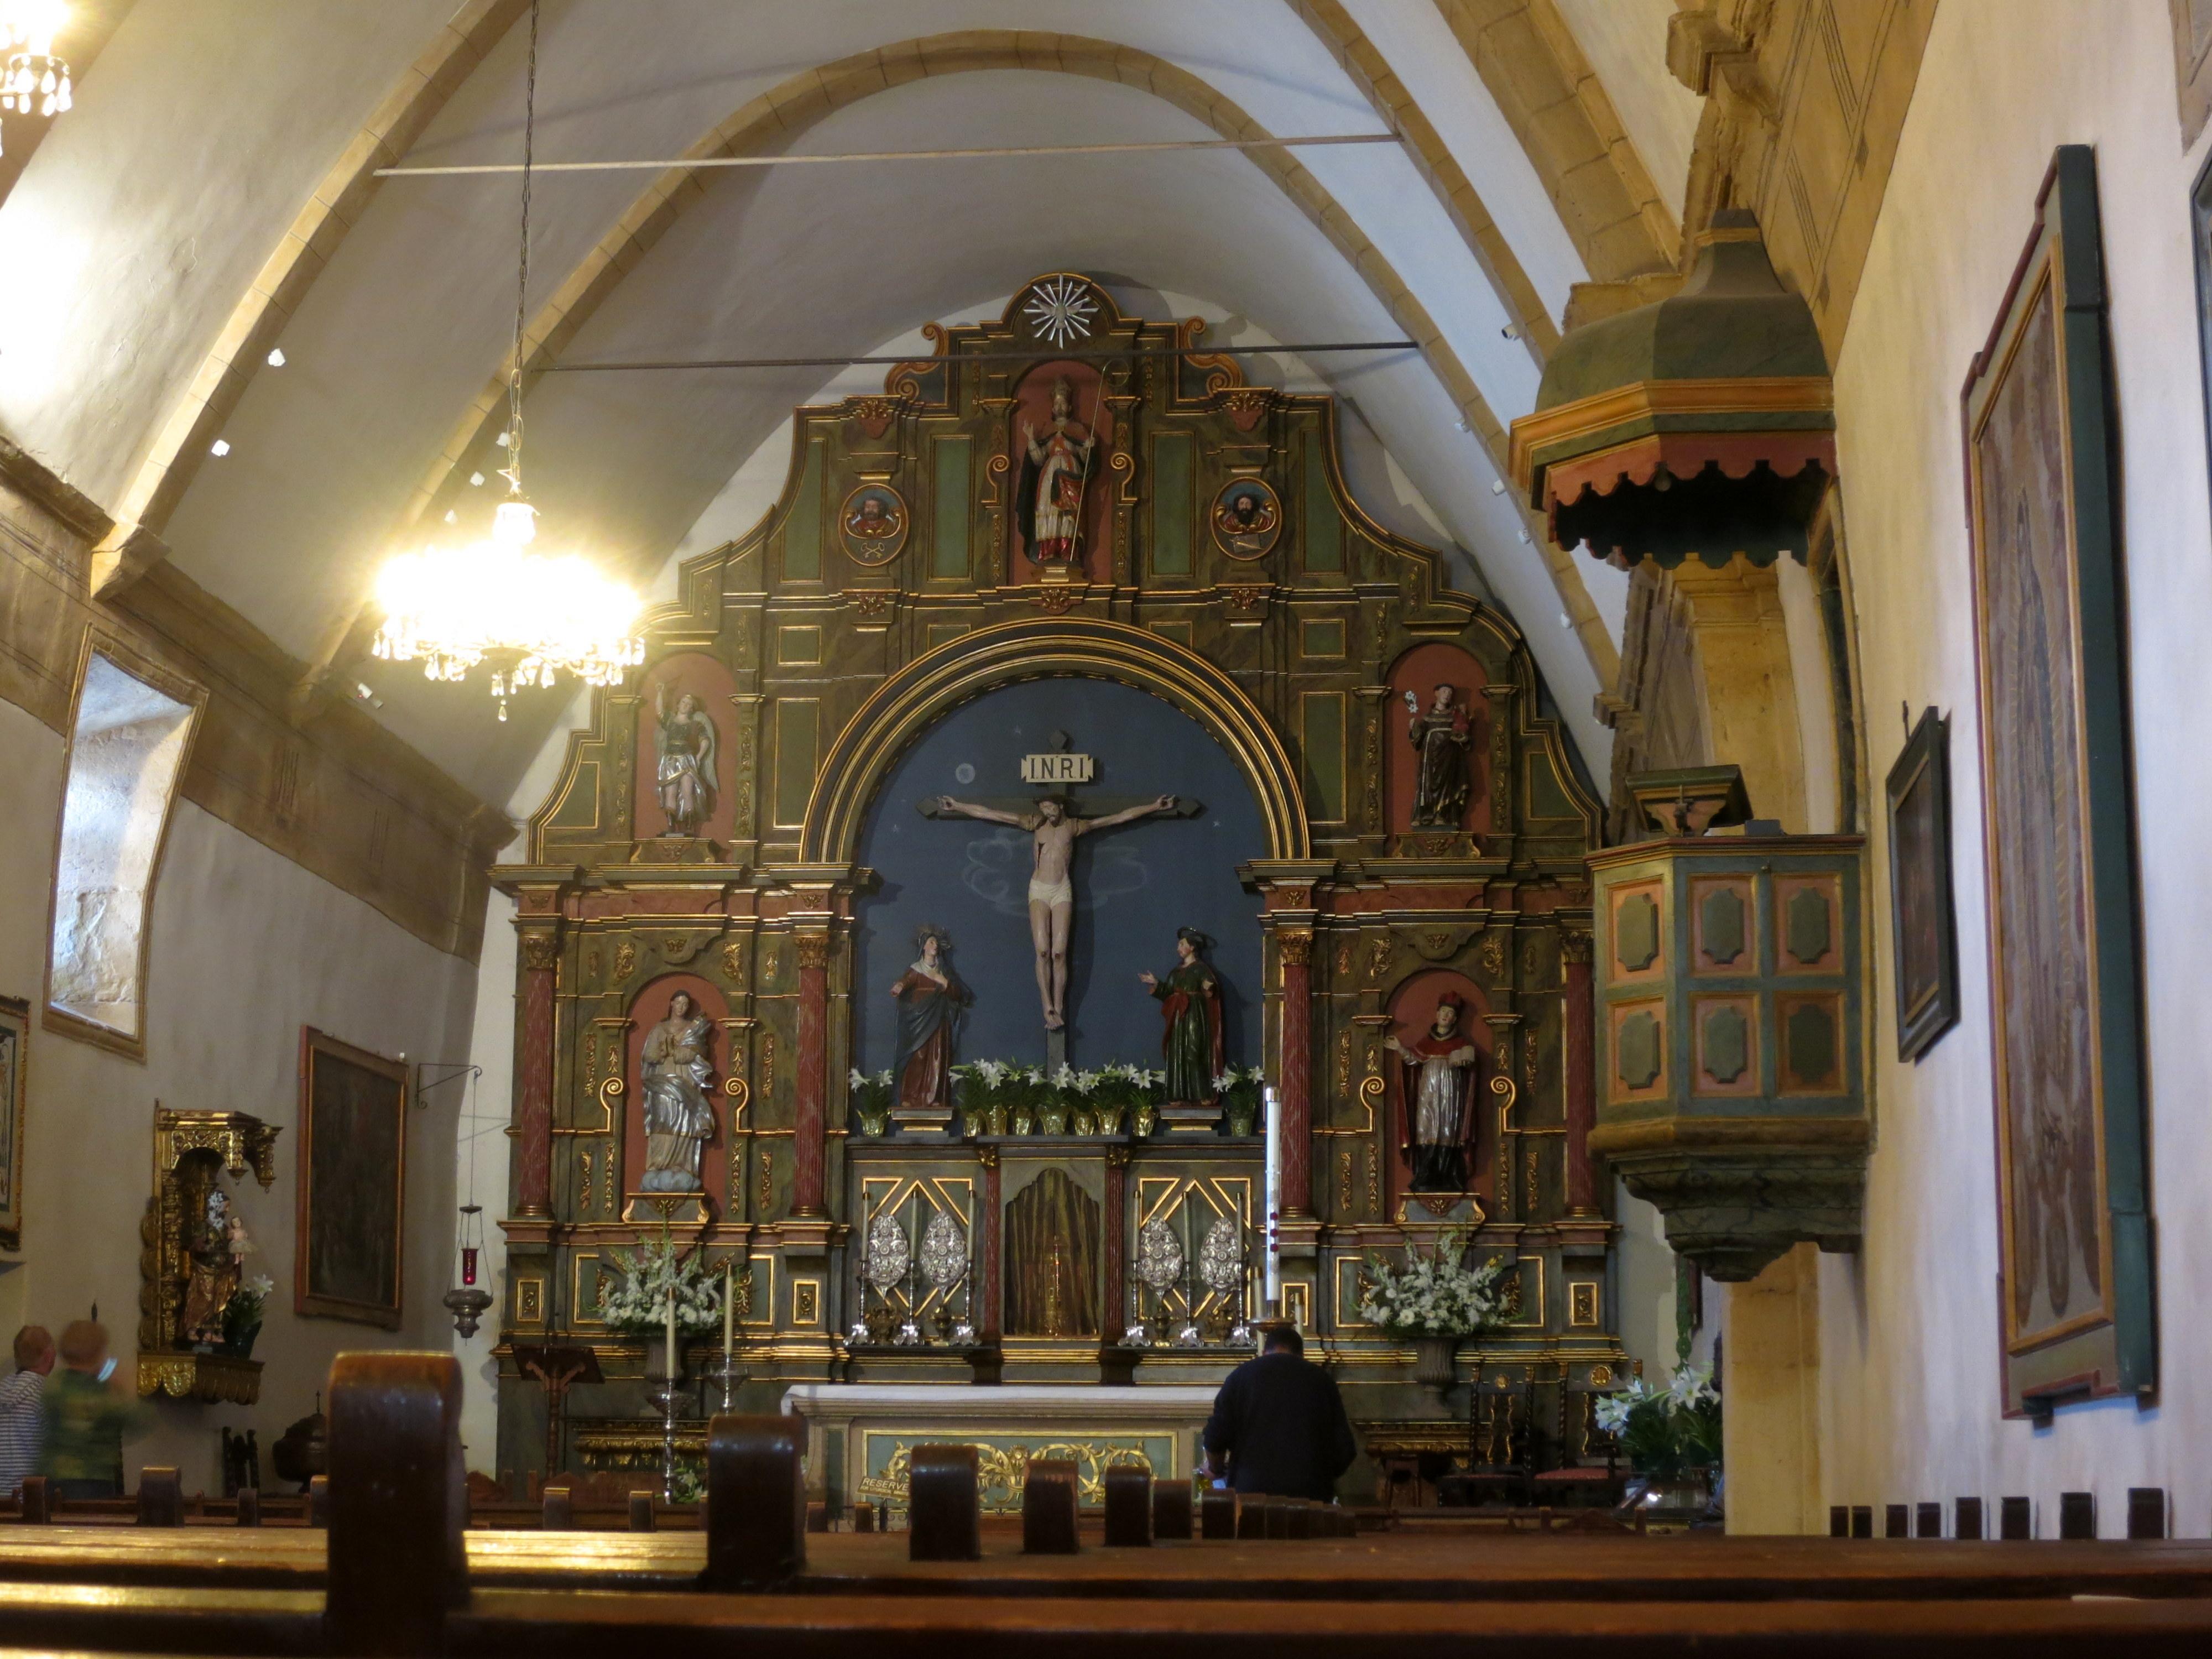 File:Mission San Carlos Borromeo de Carmelo (Carmel, CA) - basilica interior,  nave.jpg - Wikimedia Commons